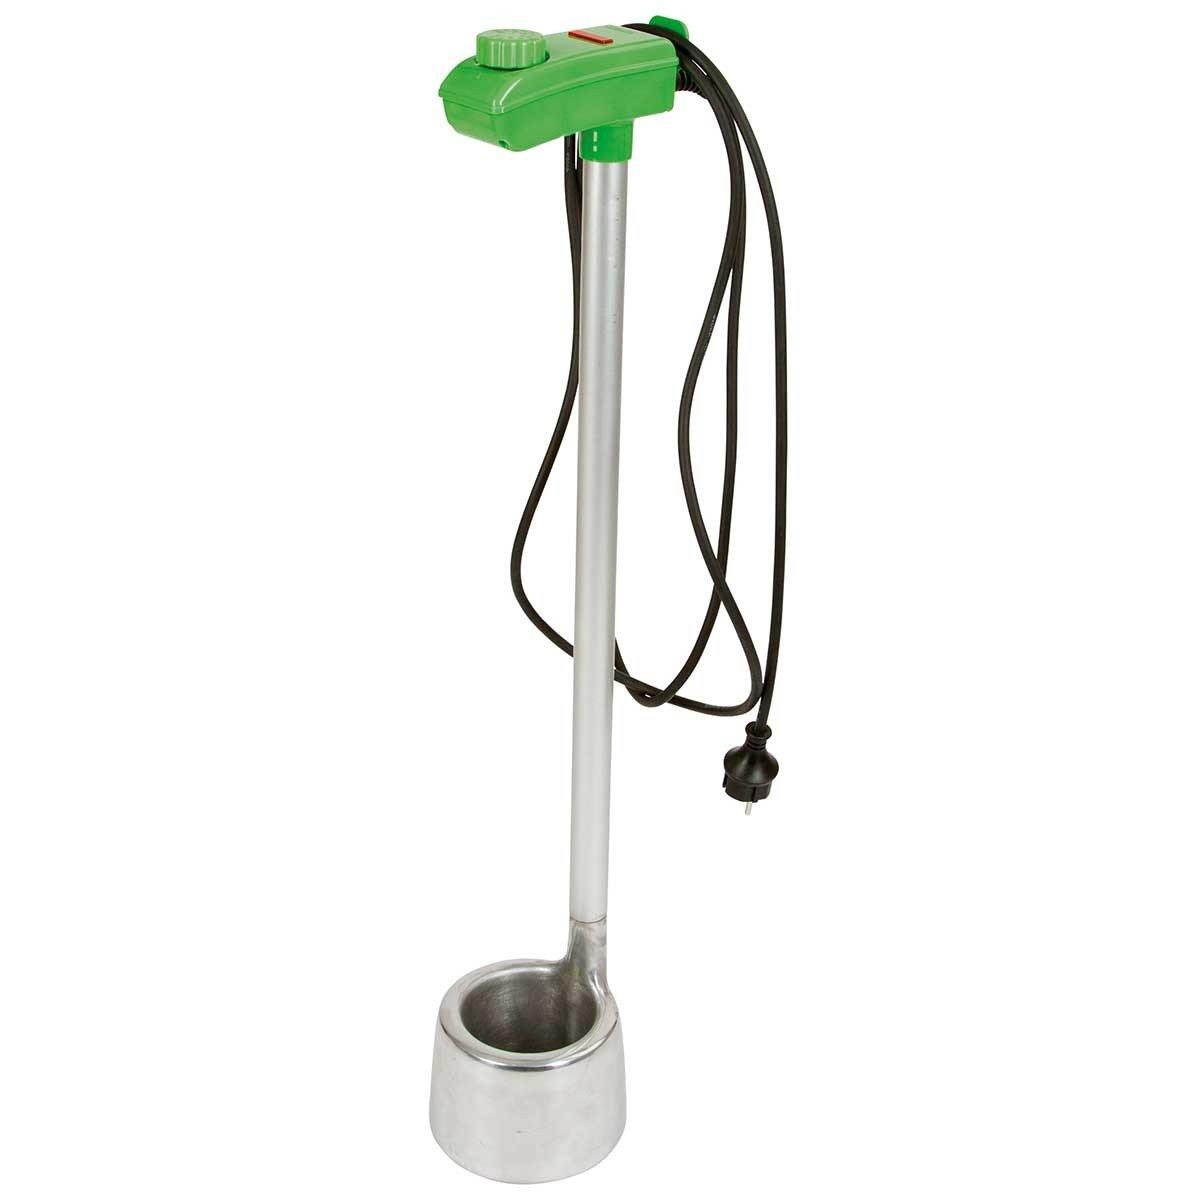 Kerbl Kälbermilcherwärmer EasyHeat 23A 2300 Watt